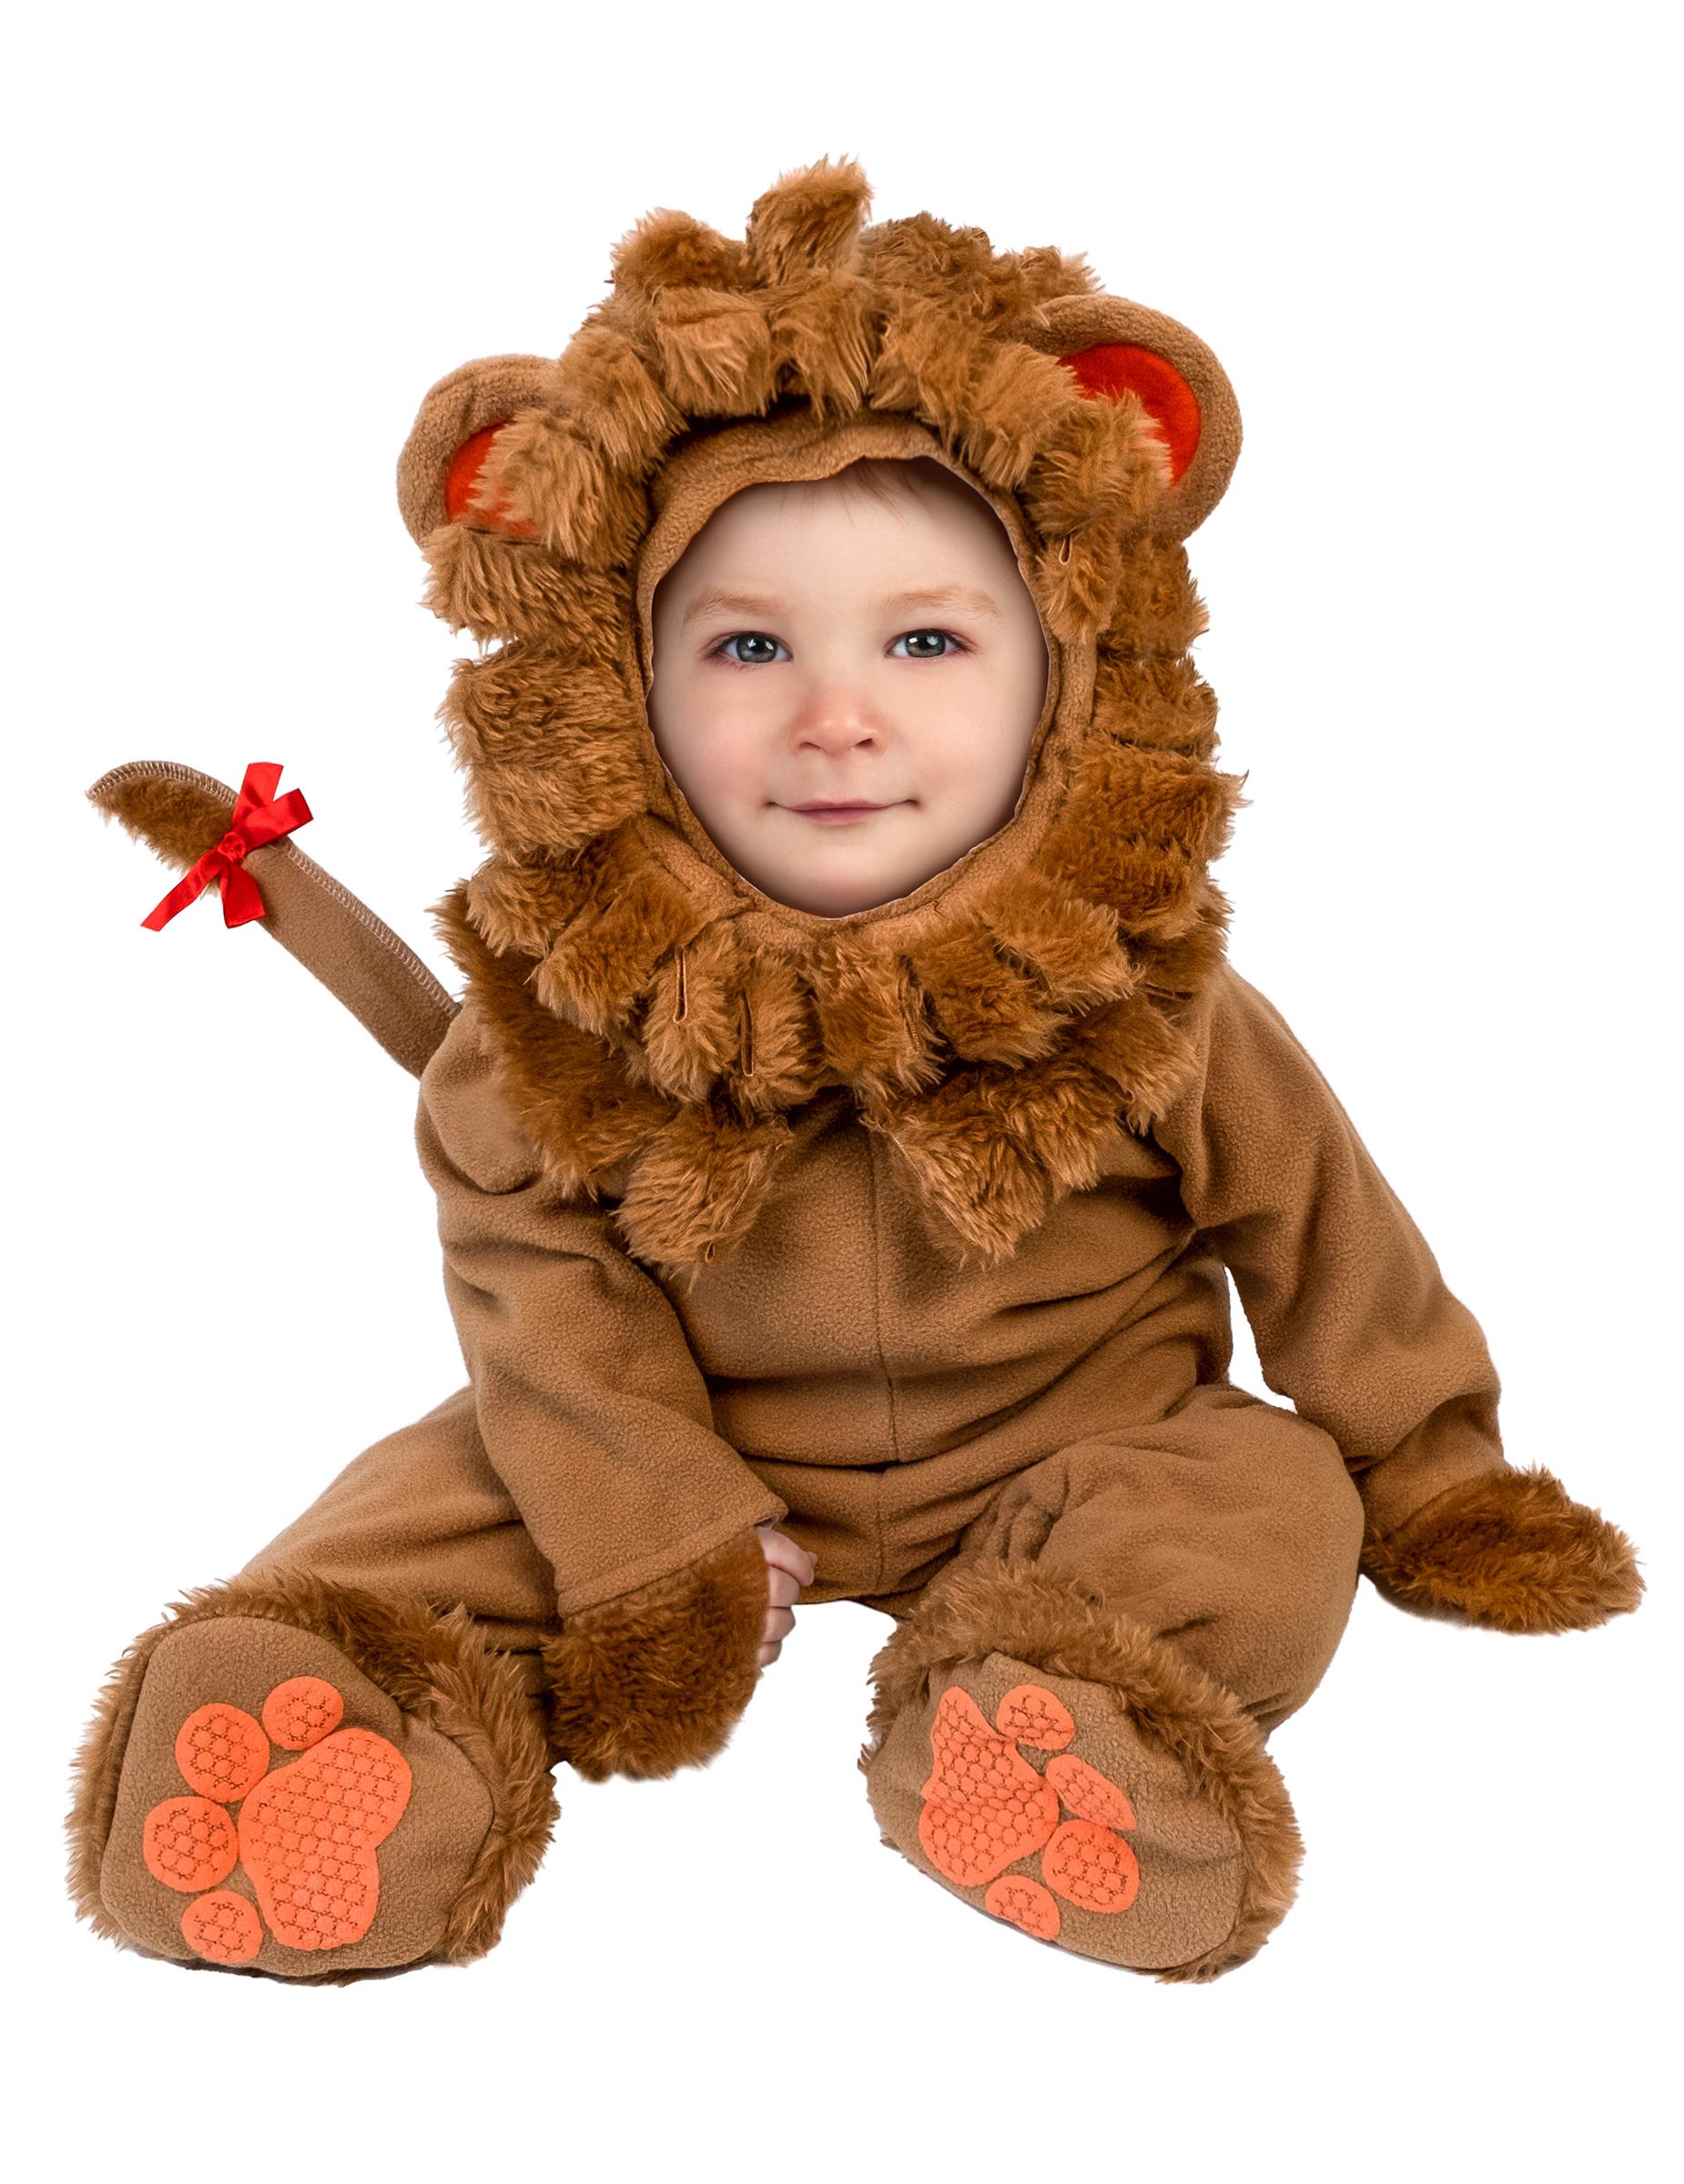 Susser Lowe Babykostum Braun Gunstige Faschings Kostume Bei